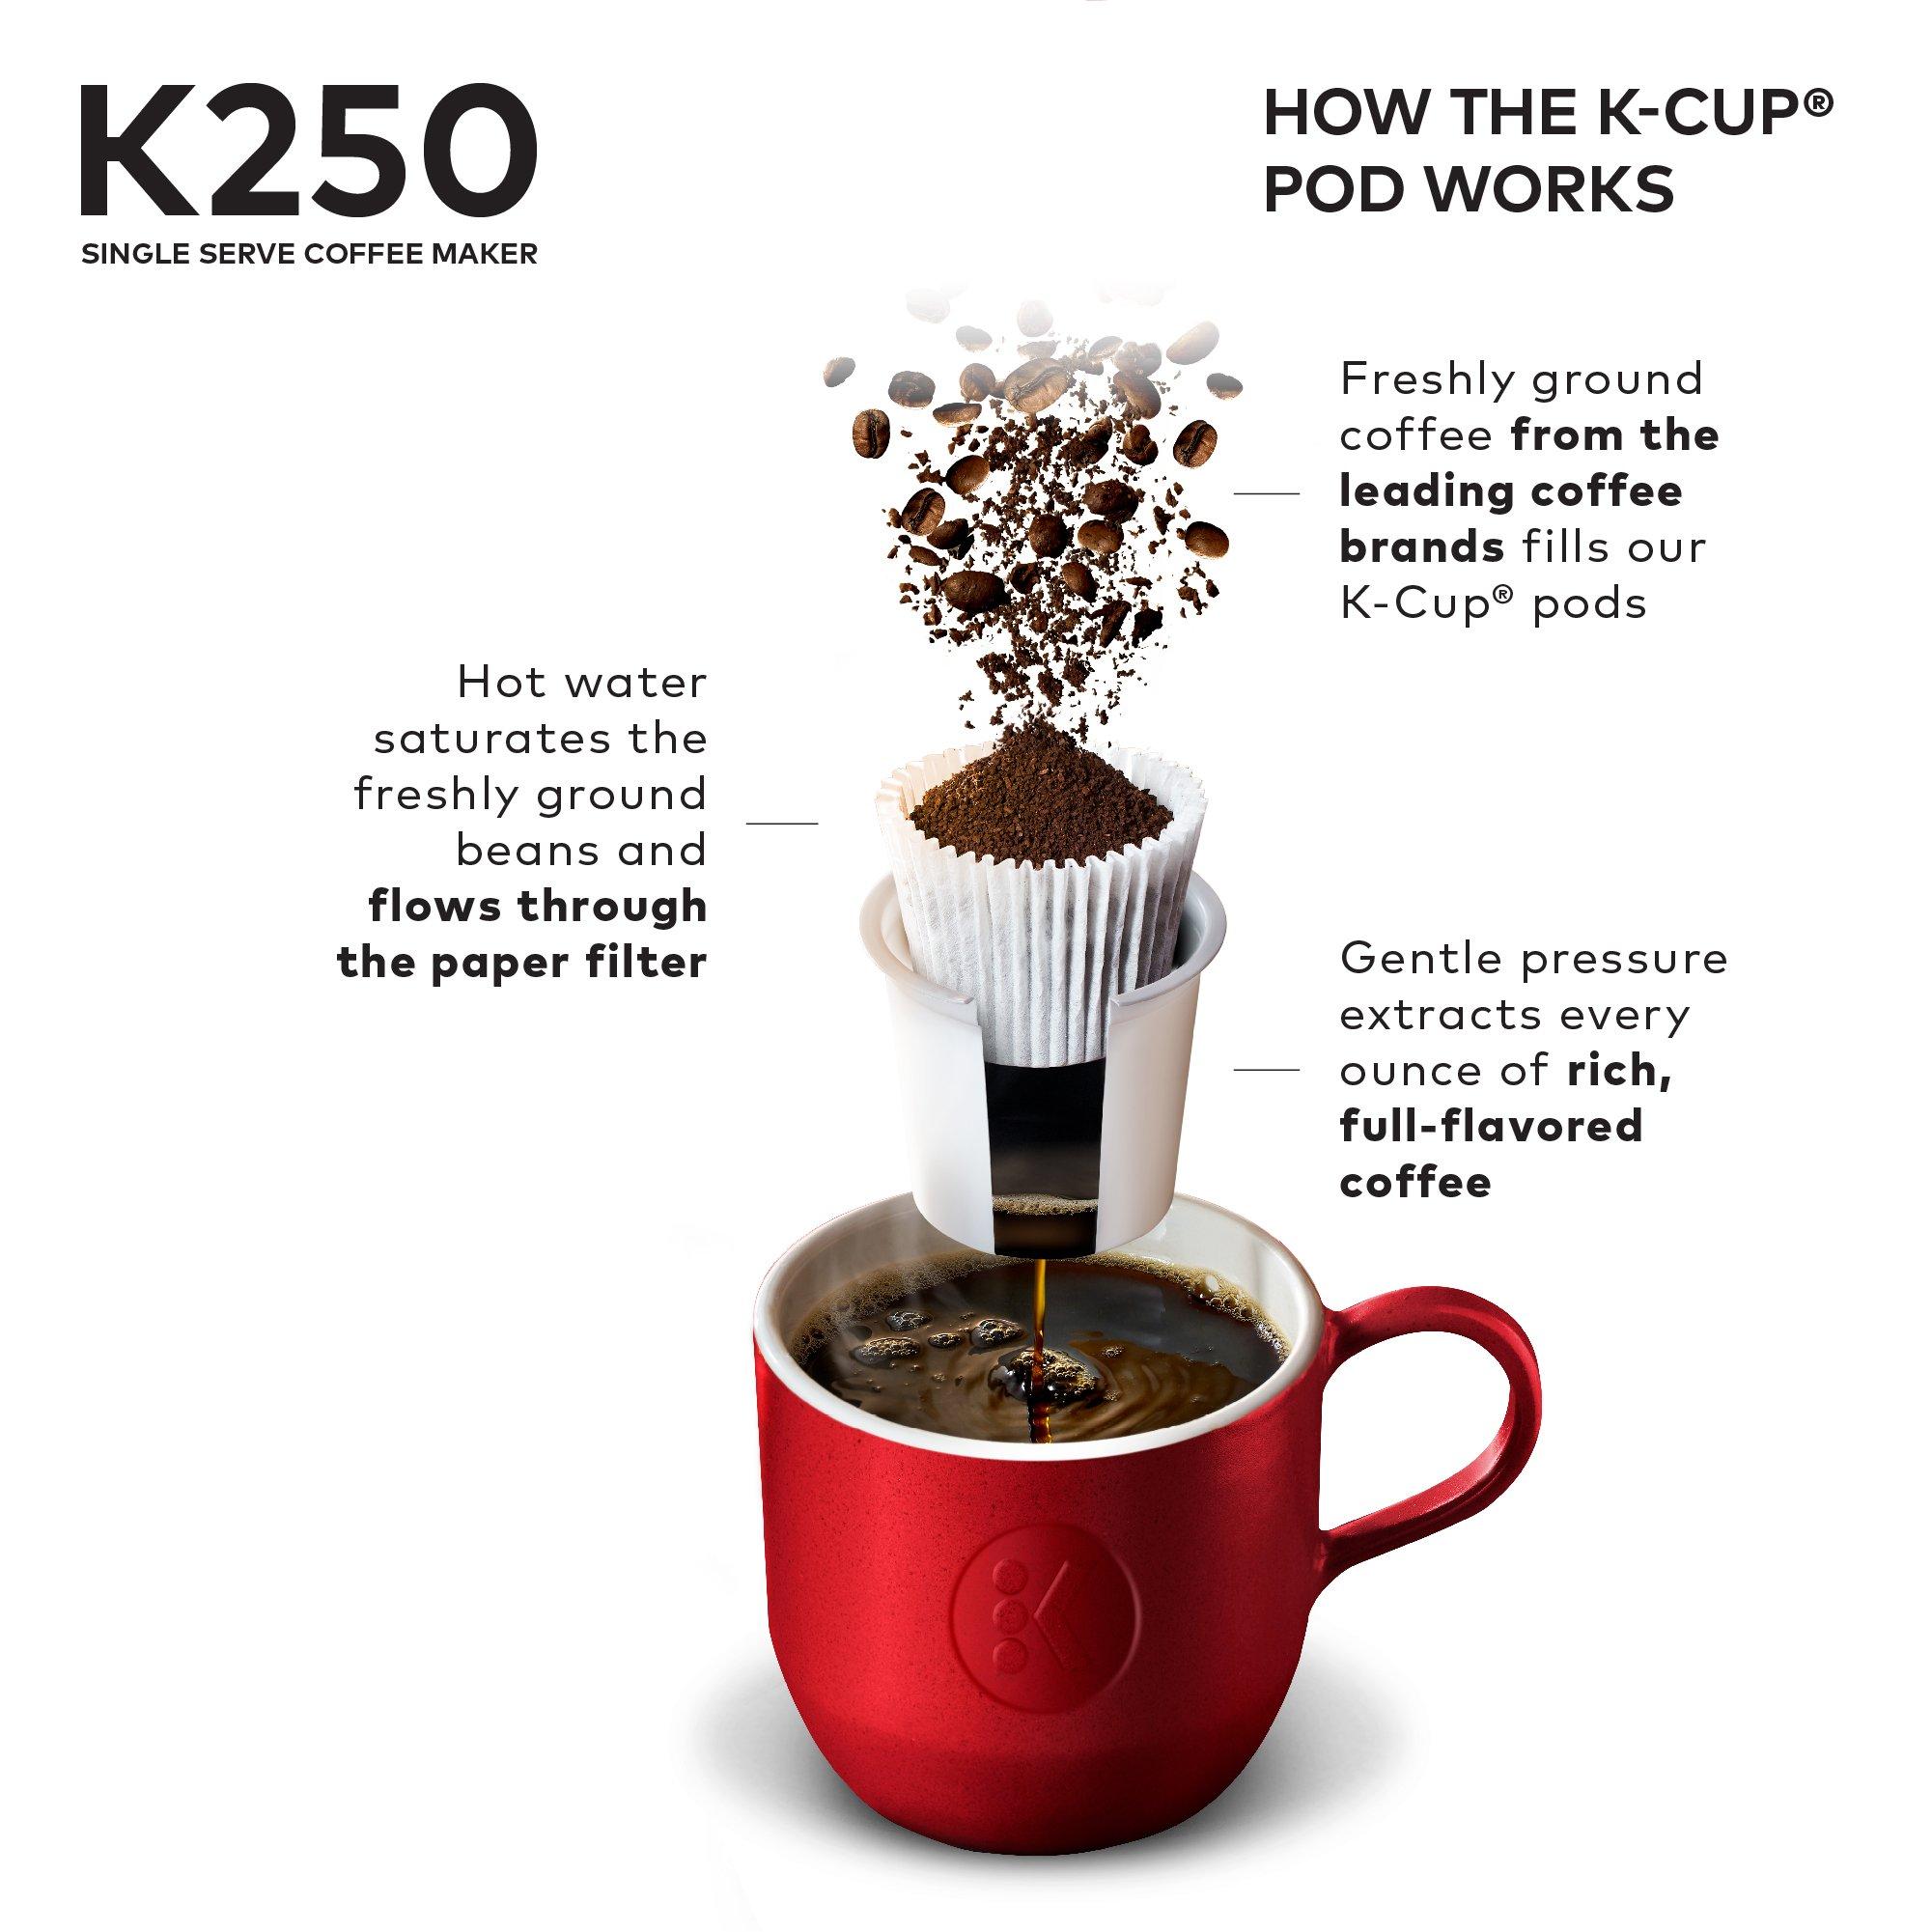 Keurig K250 Single Serve K-Cup Pod Coffee Maker with Strength Control Plum Grey Plum Grey by Keurig (Image #8)